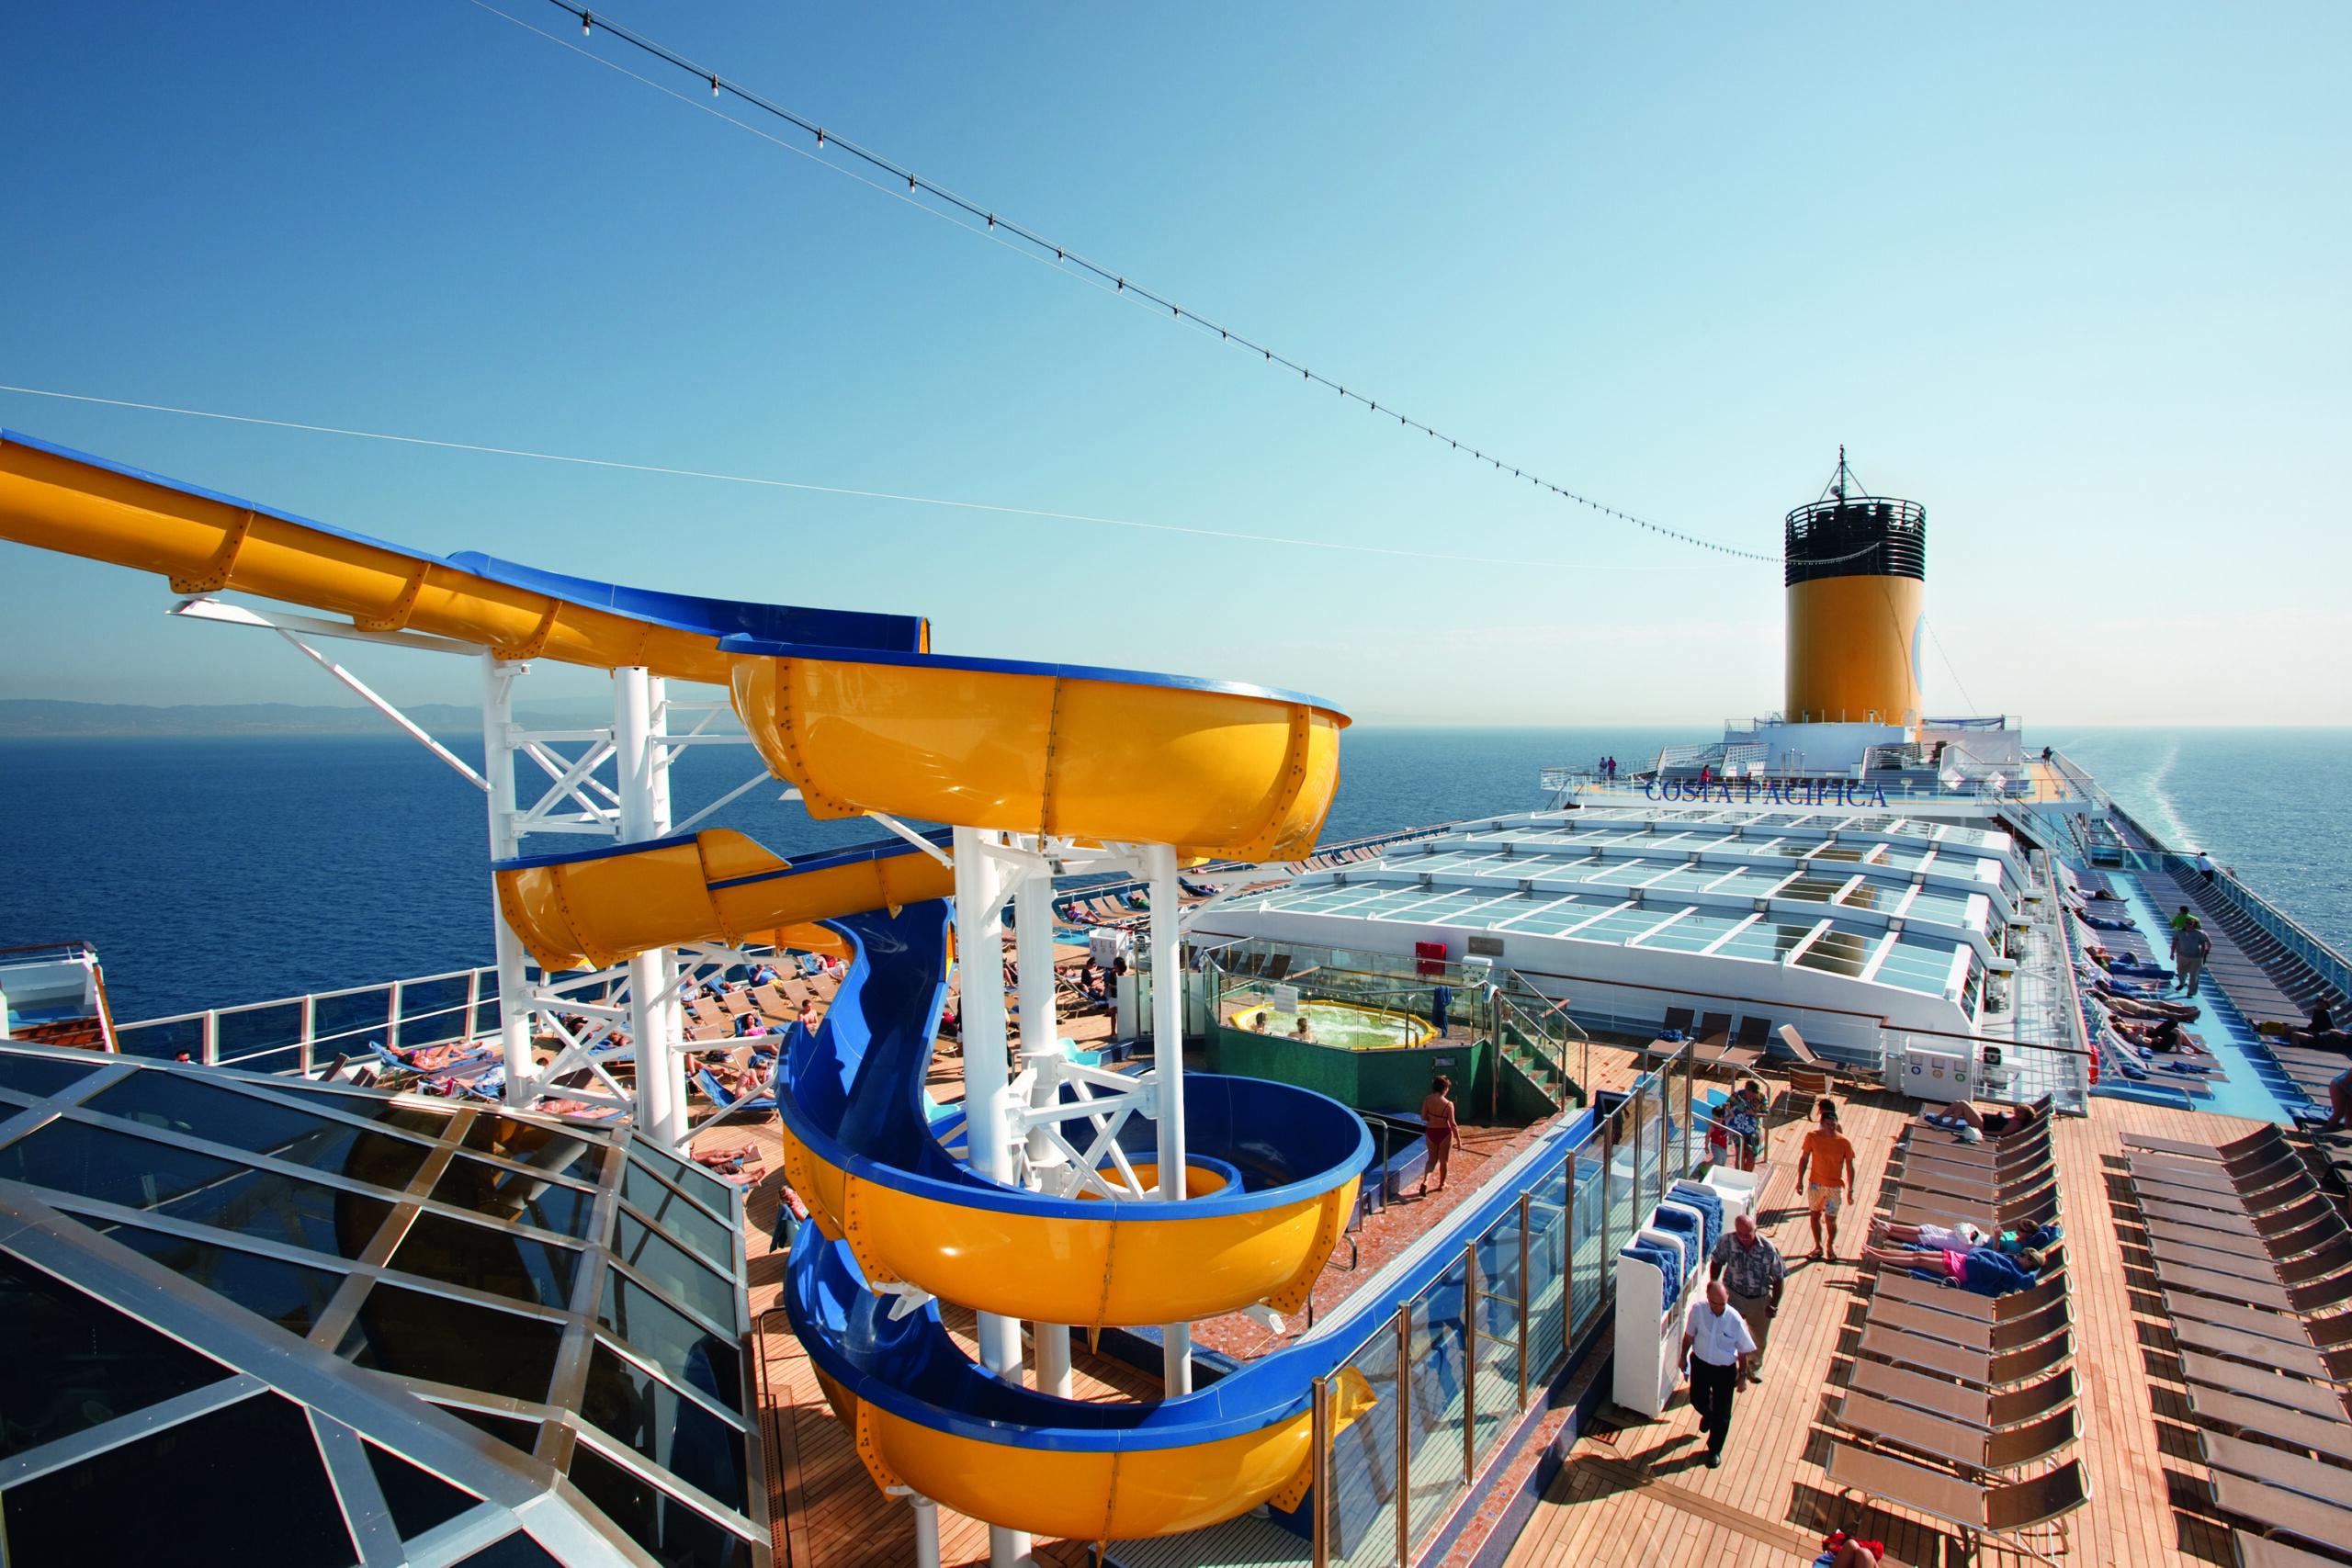 Cruiseschip-Costa Pacifica-Costa Cruises-Glijbaan